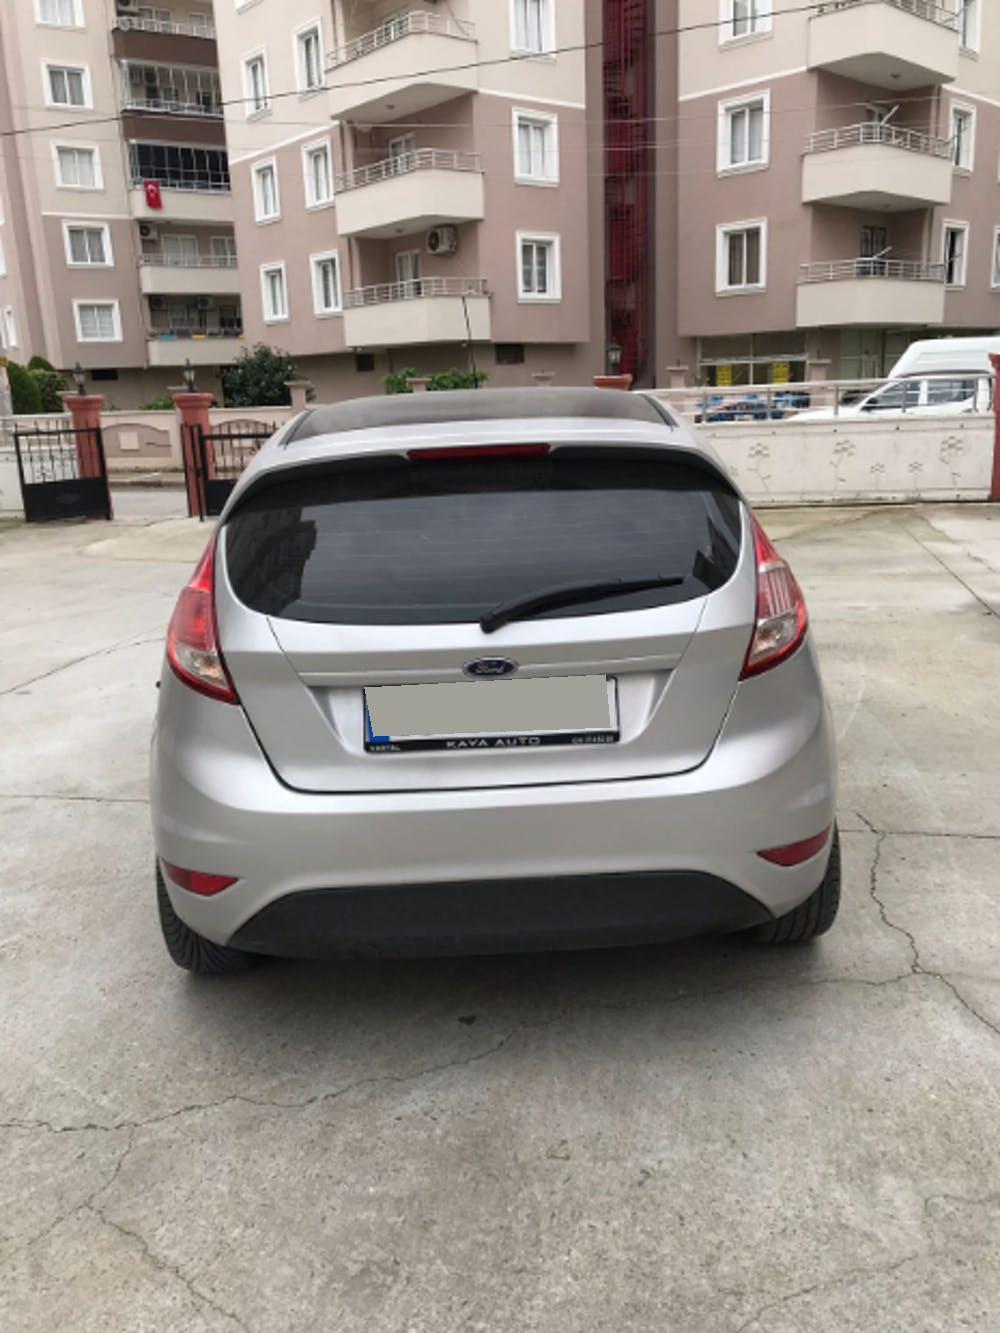 FORD Fiesta 2013 Model Dizel Manuel Vites Kiralik Araç - 289D